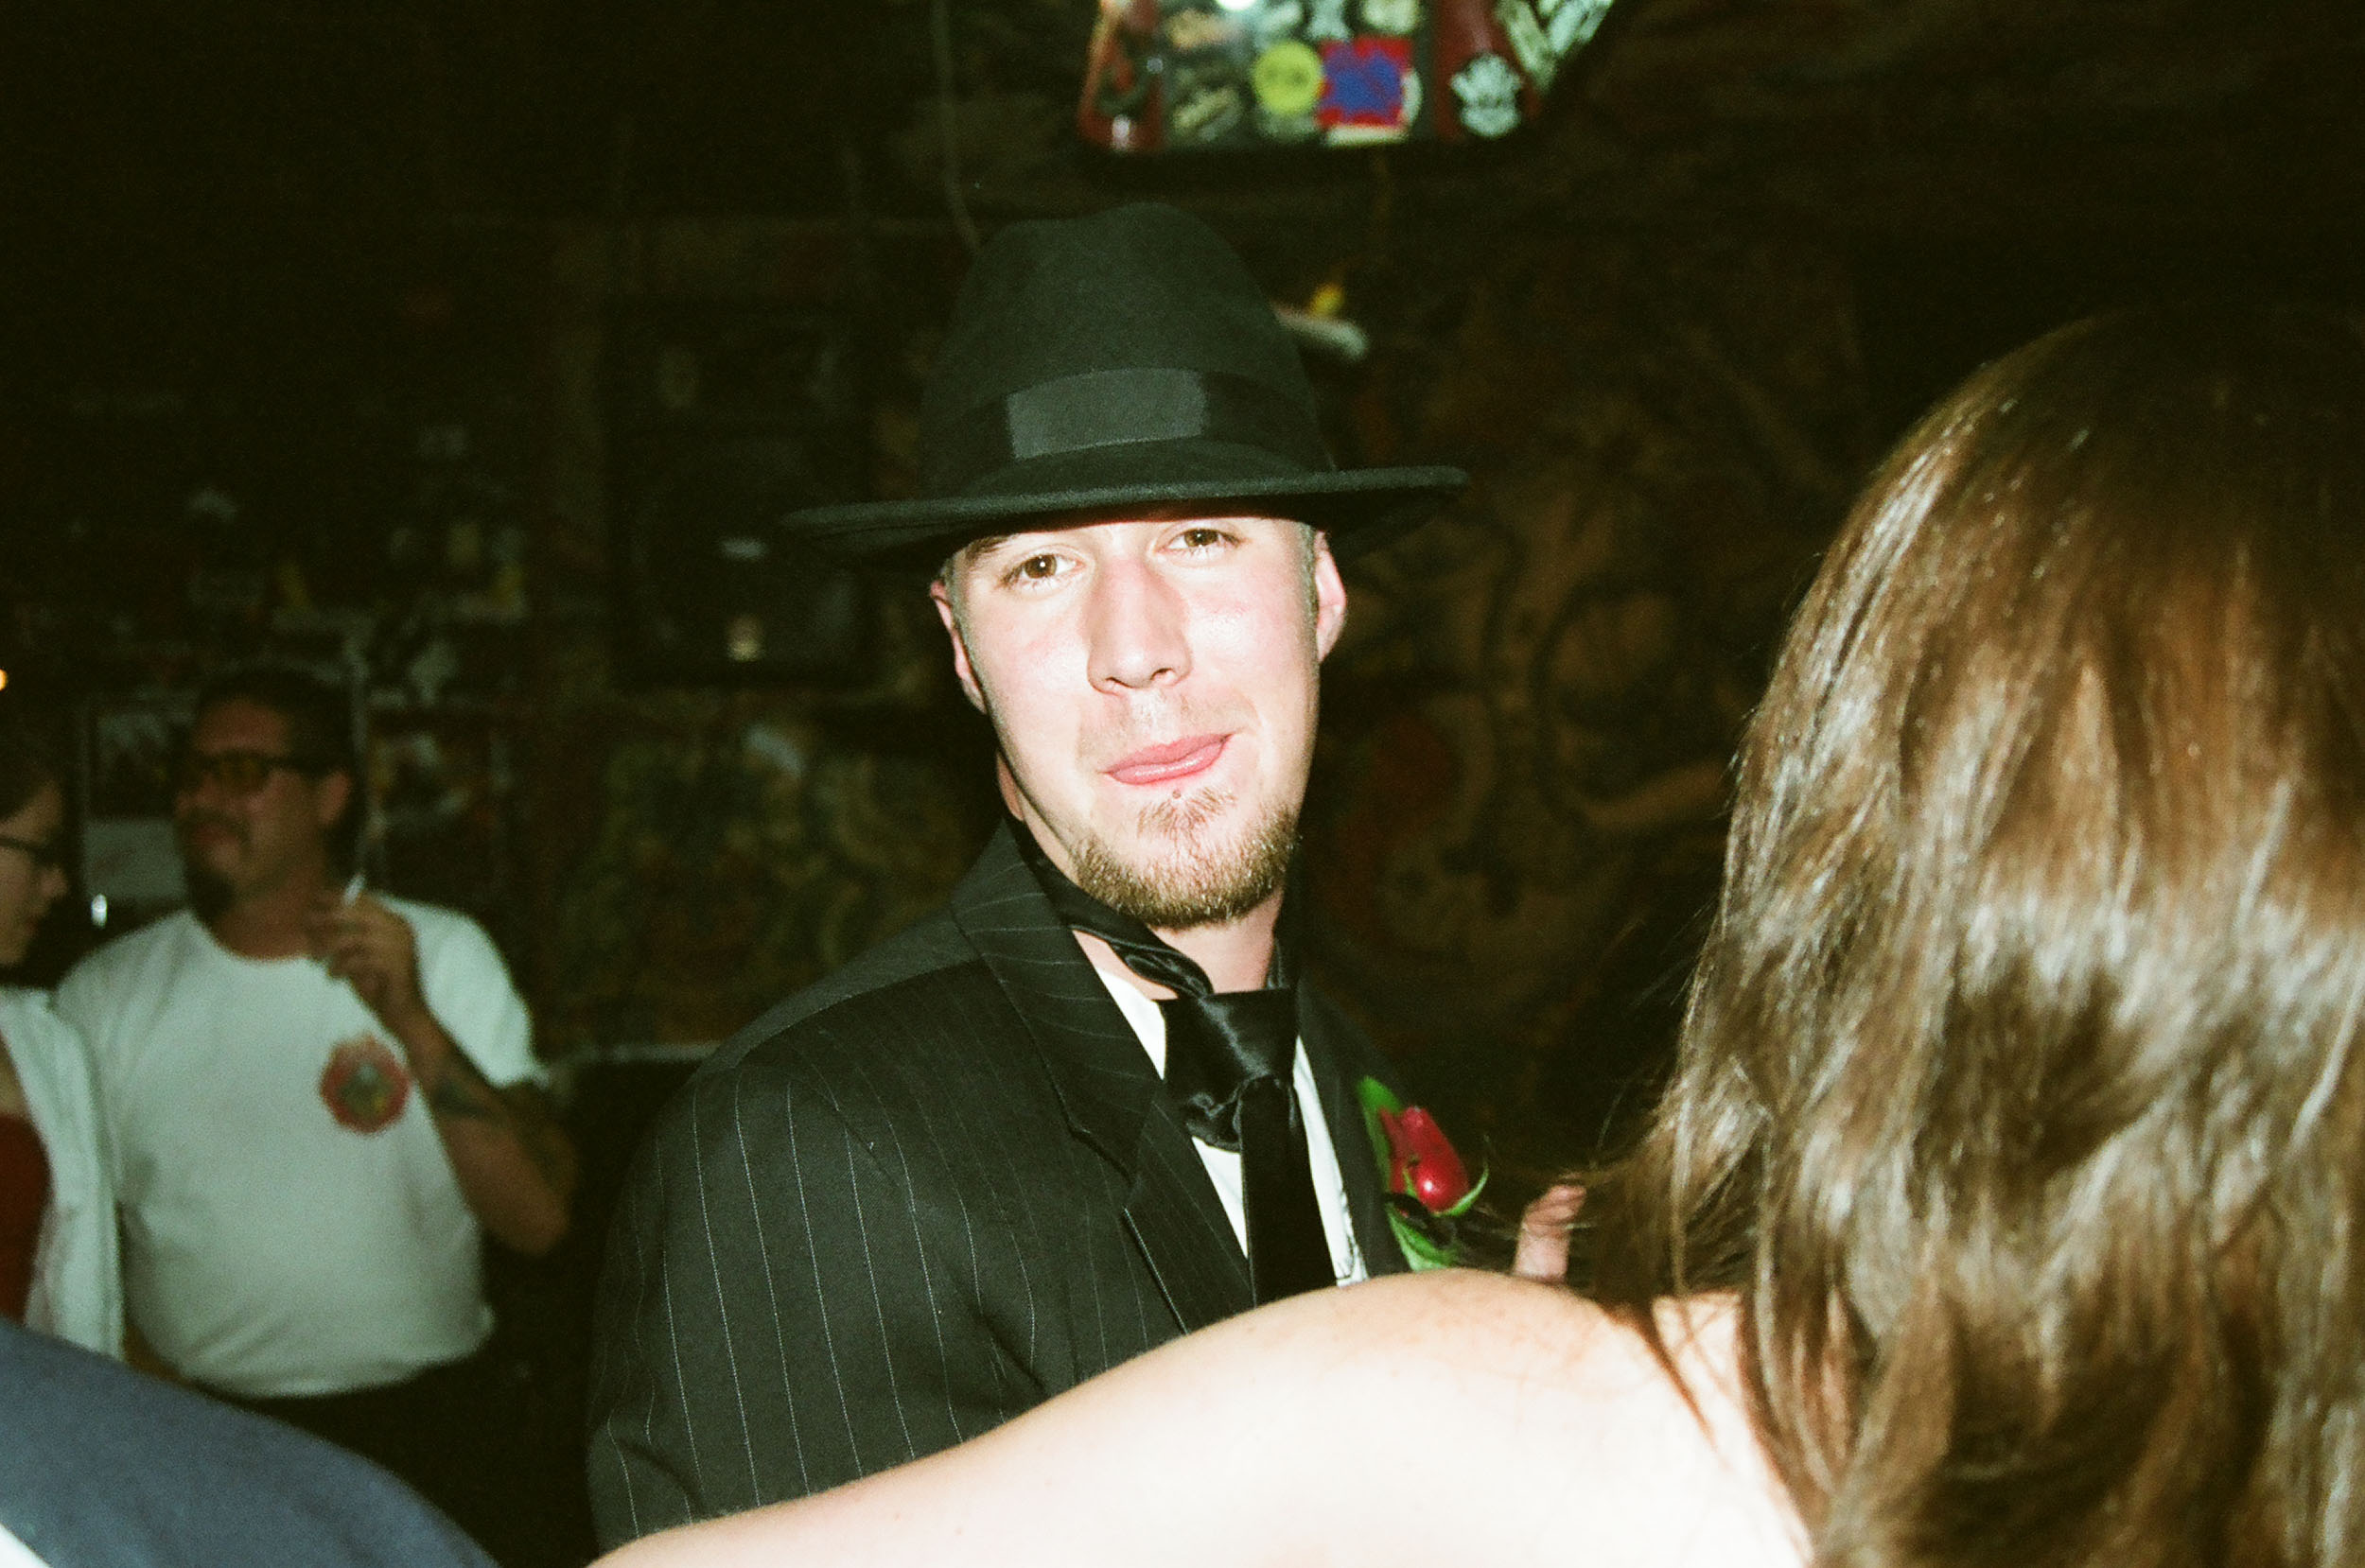 After Party, Las Vegas Nice Tie